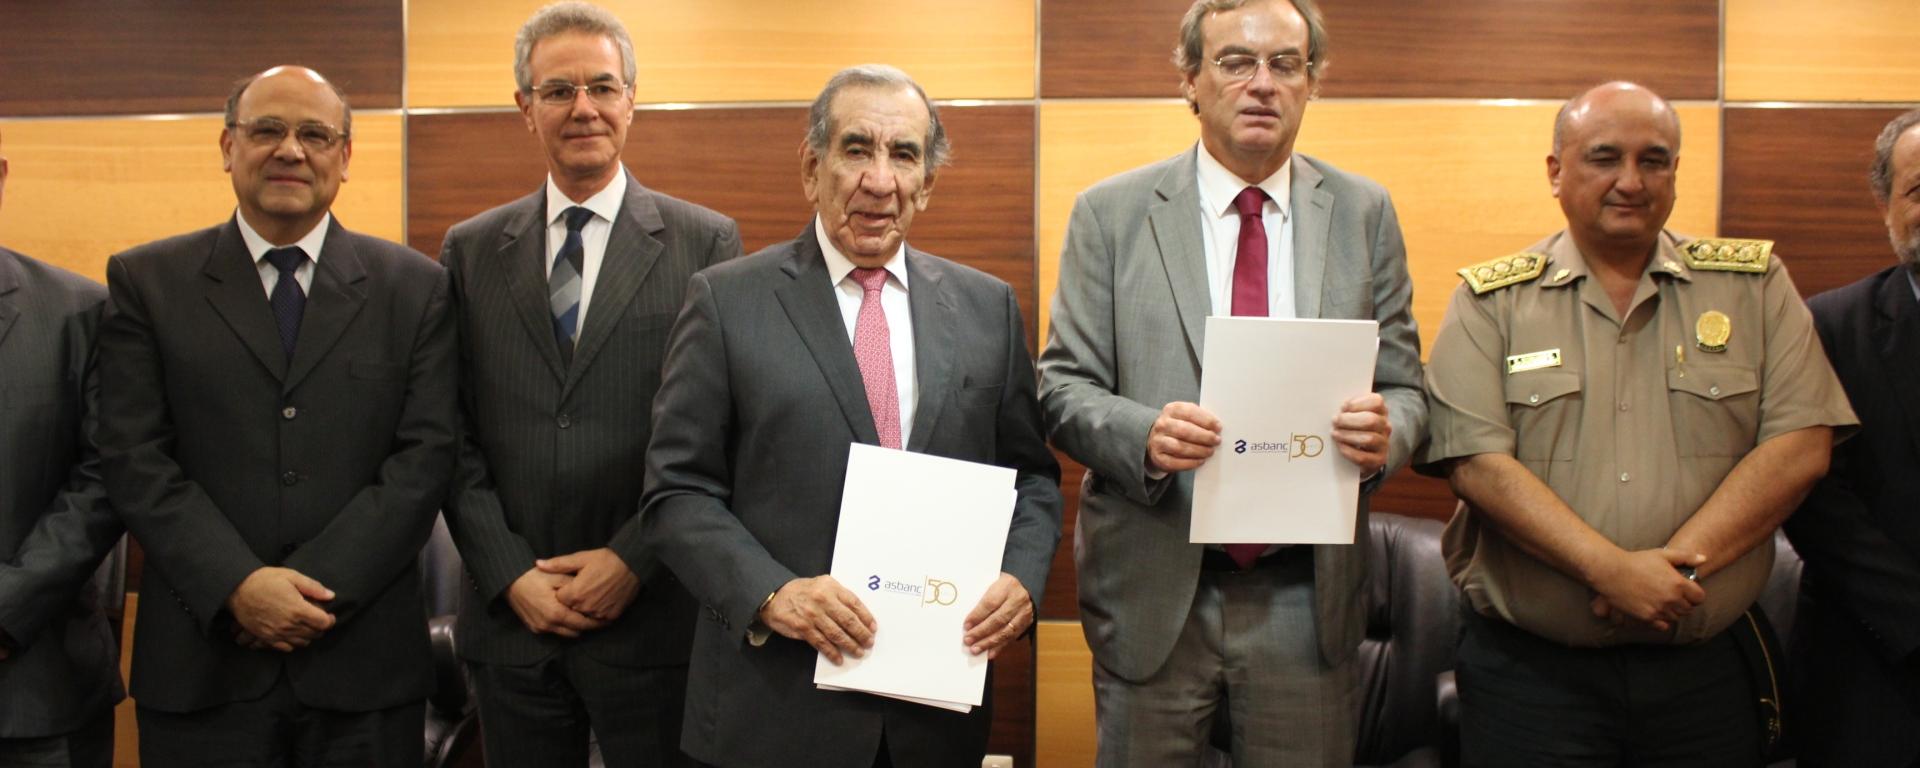 PRESIDENTE DE ASBANC Y MINISTRO DEL INTERIOR | FOTO ASBANC